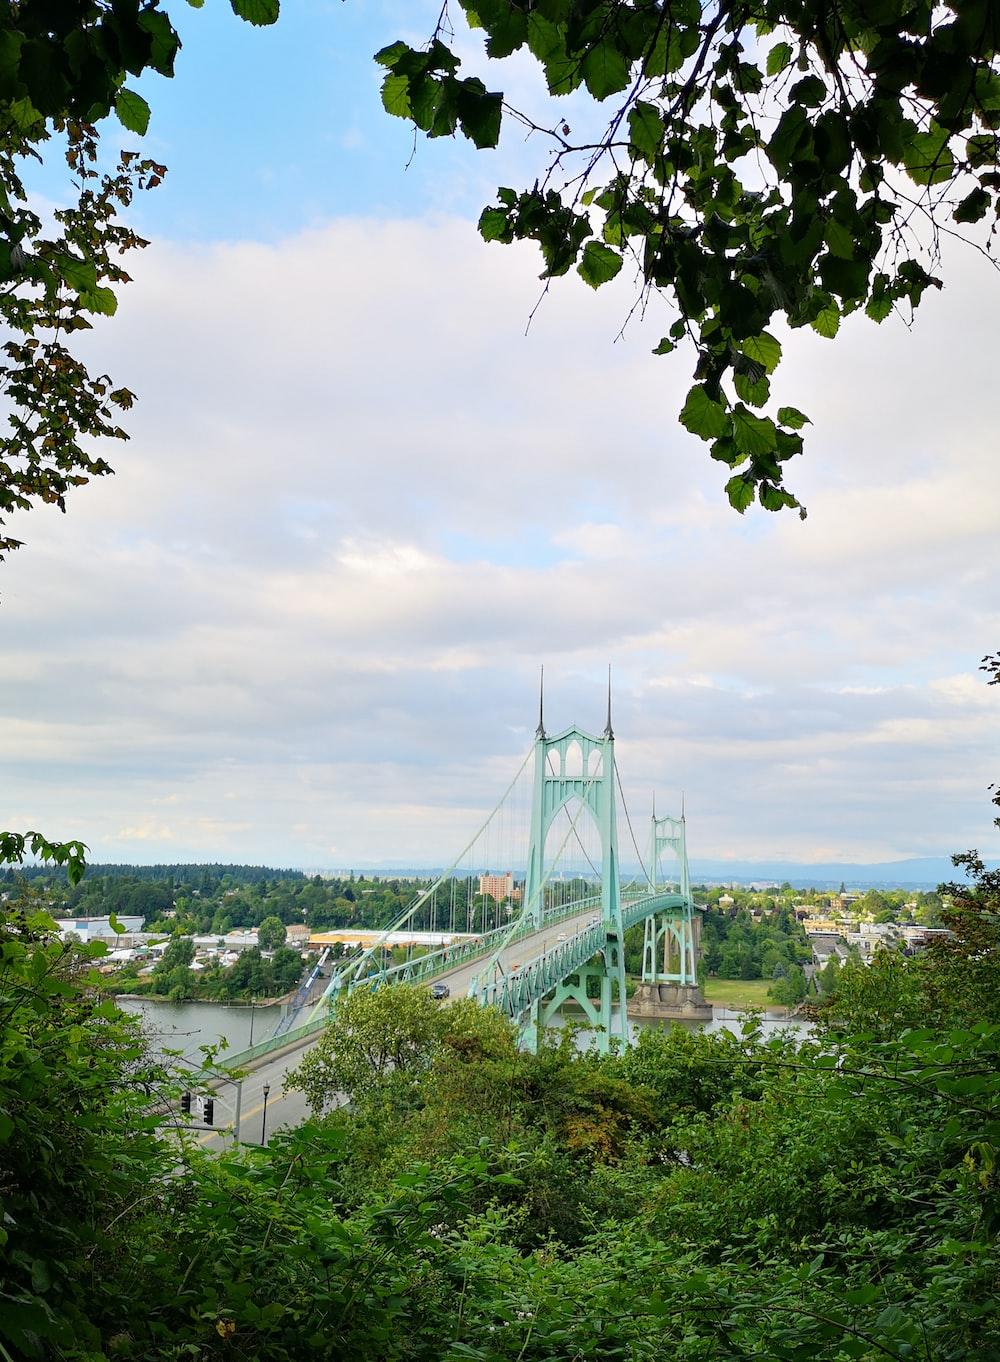 teal bridge near trees